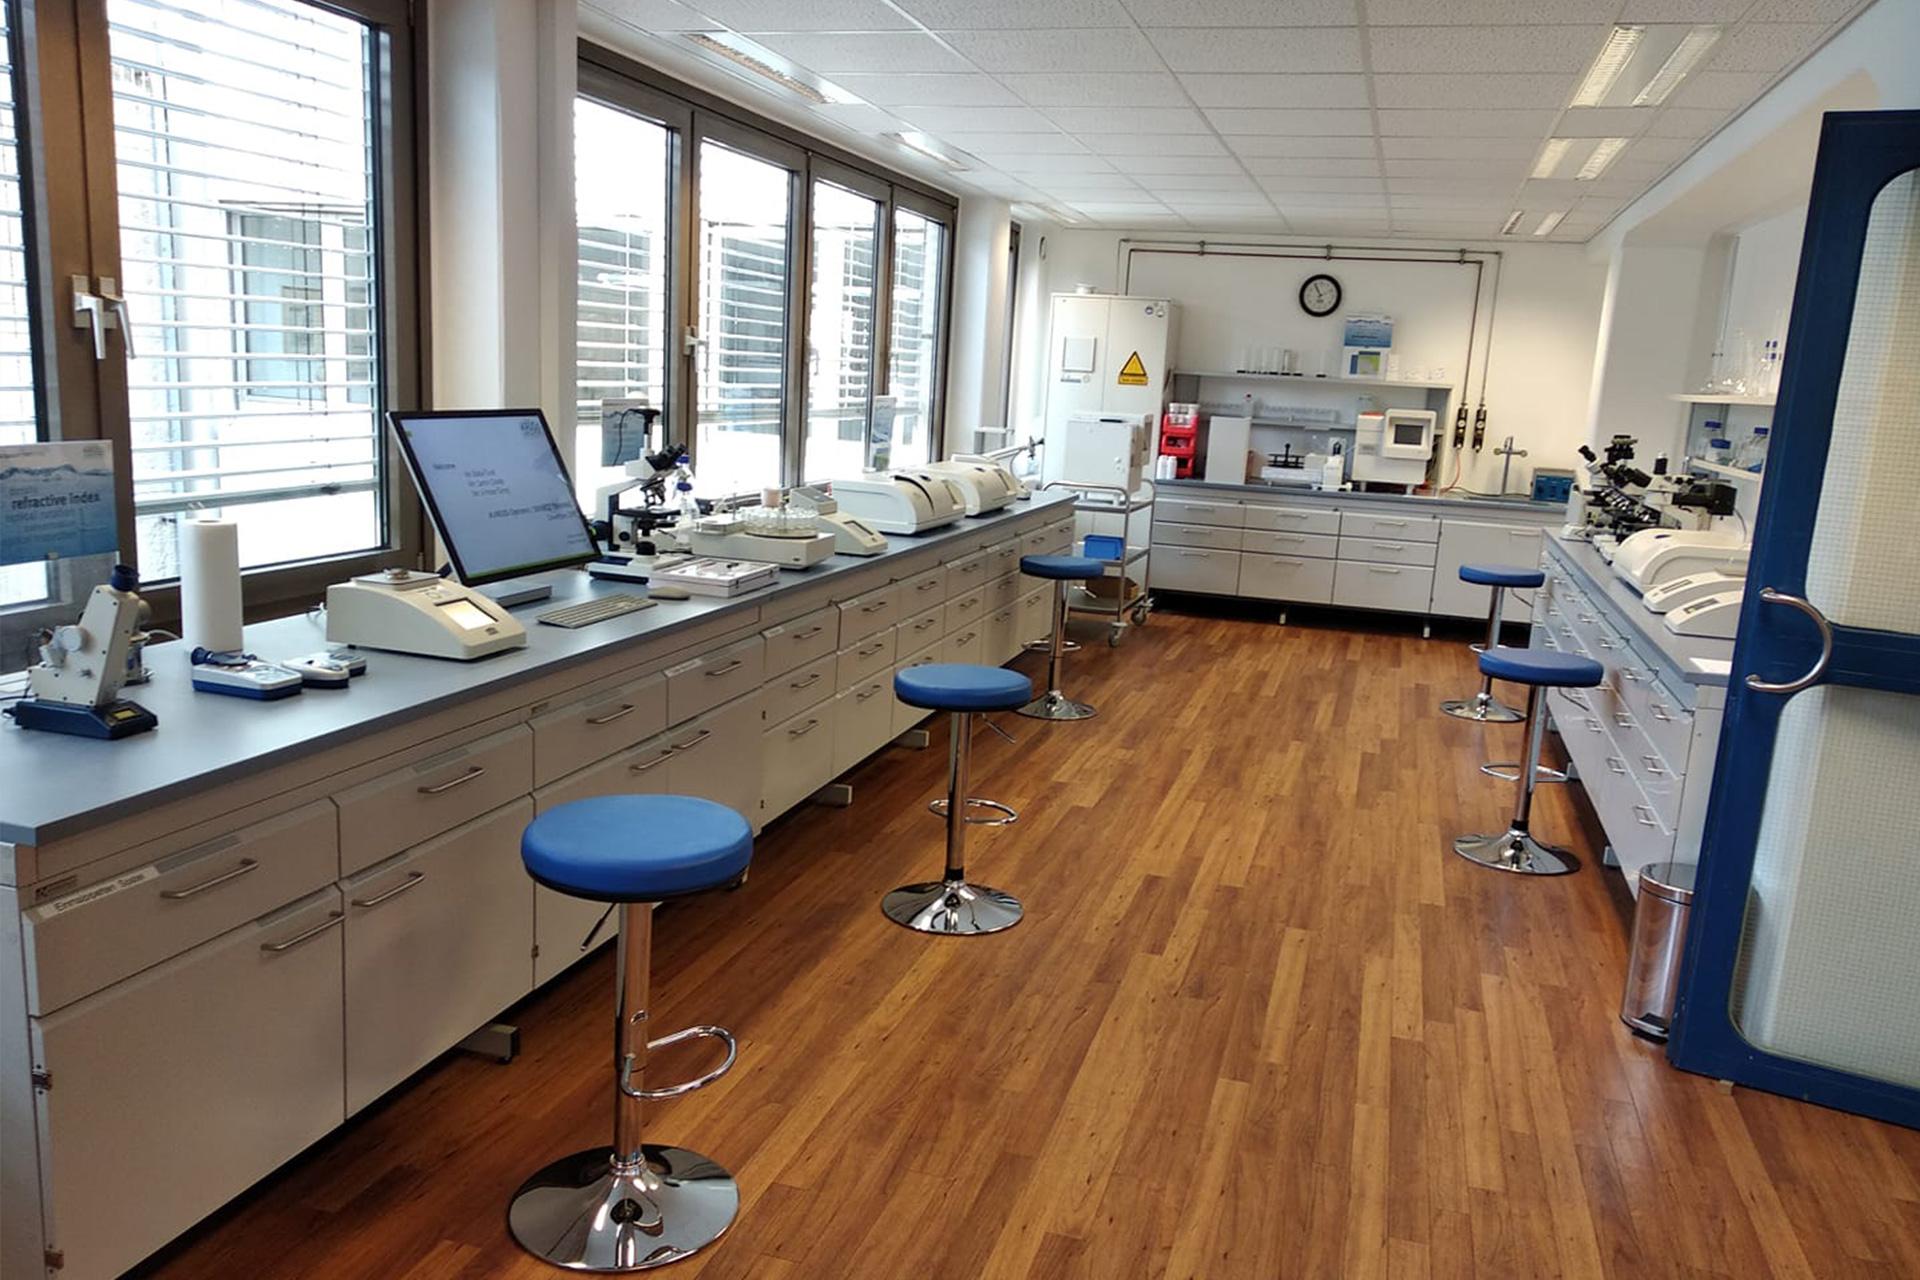 A Krüss Optronic Training Centre